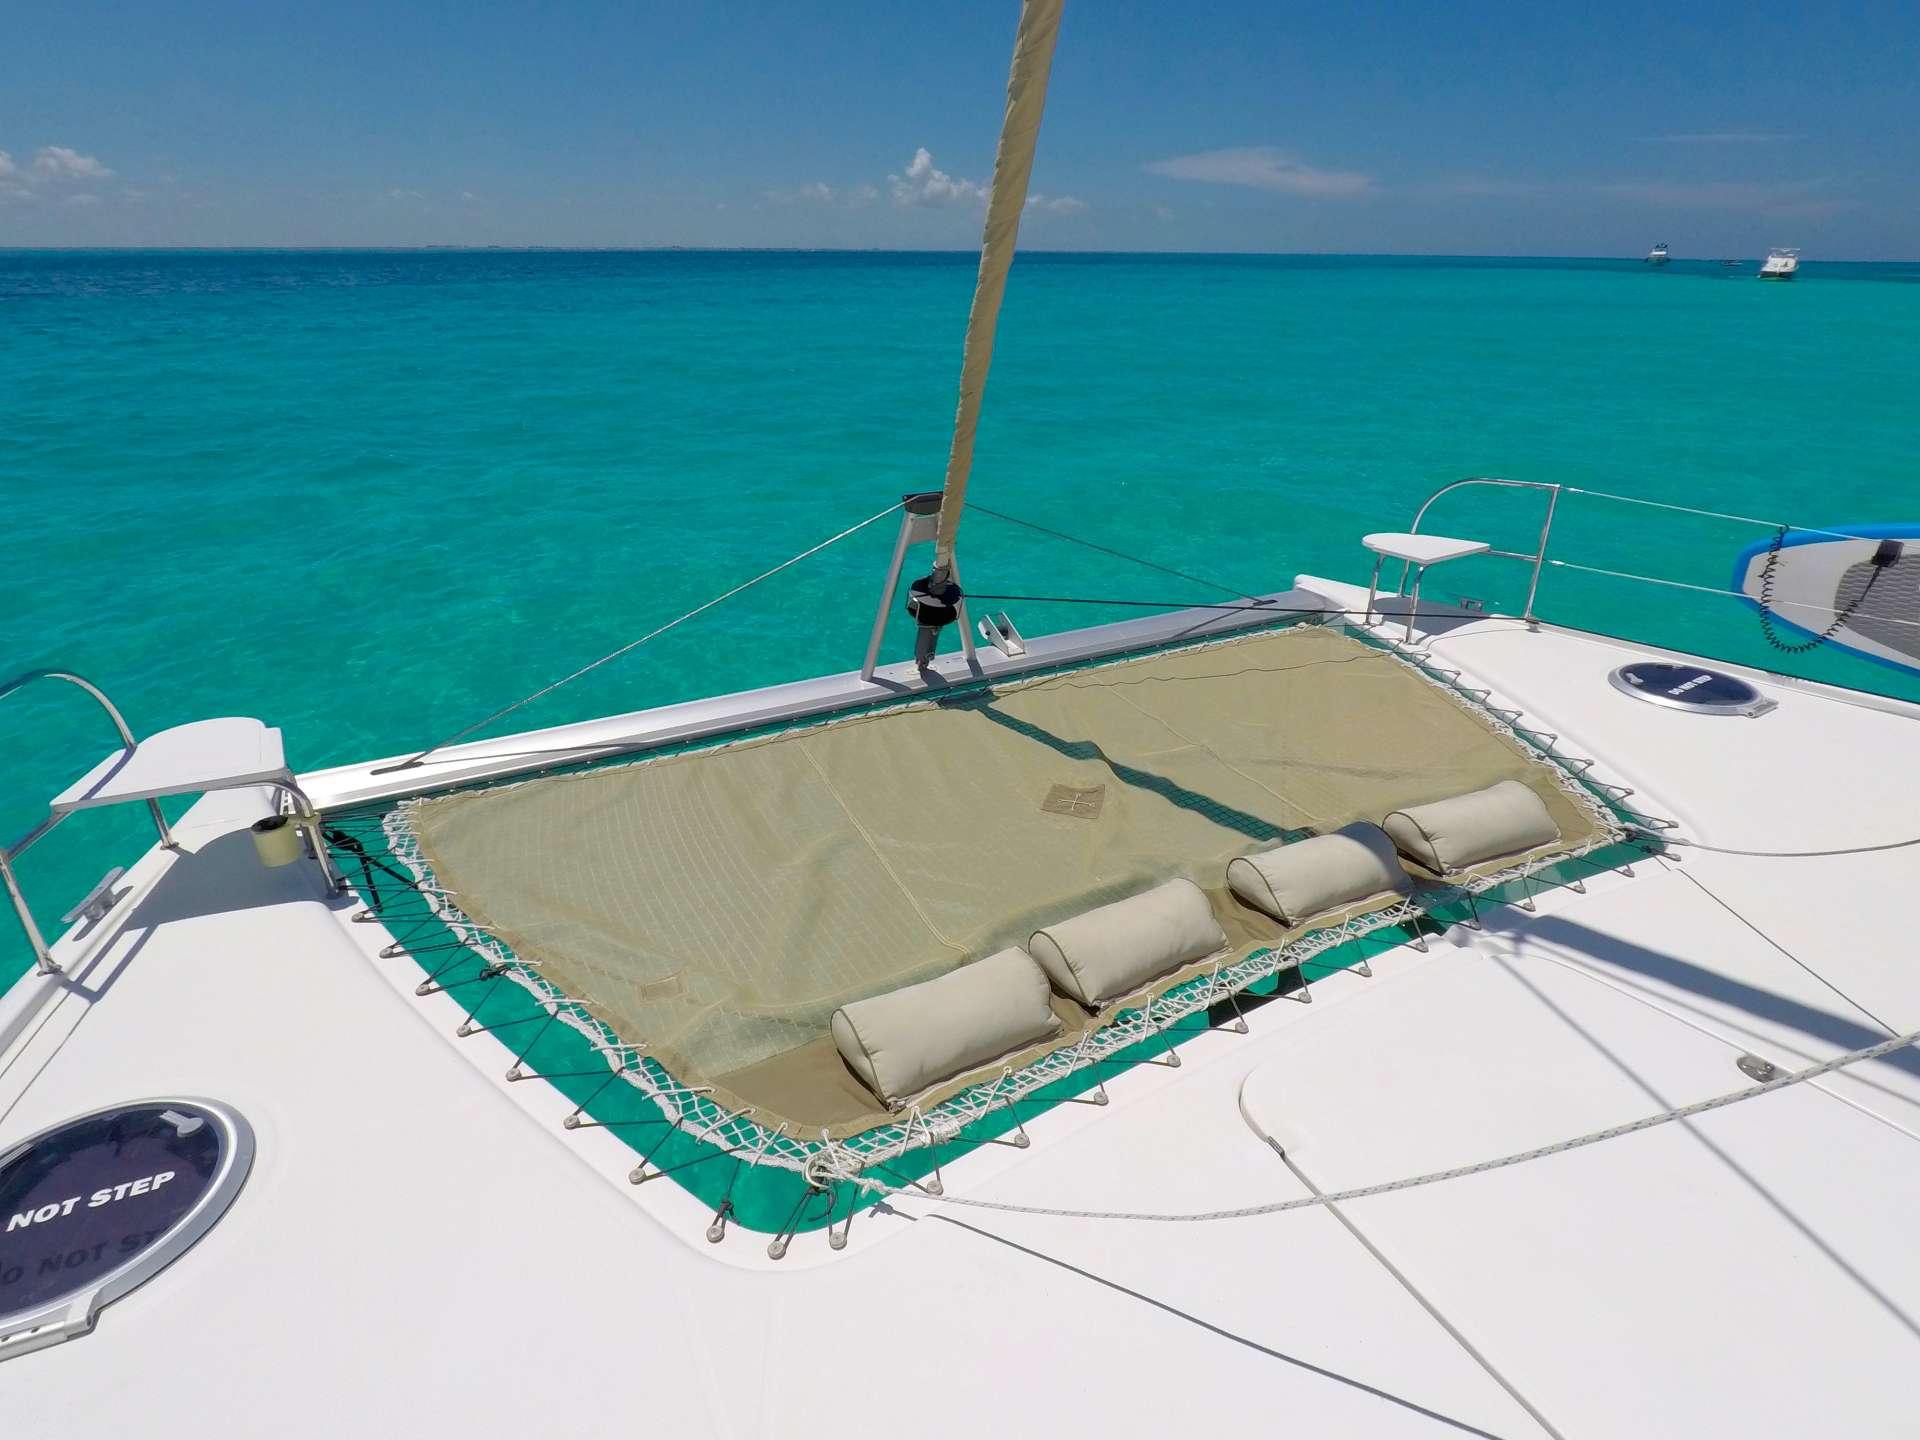 SAIL PENDING yacht image # 4